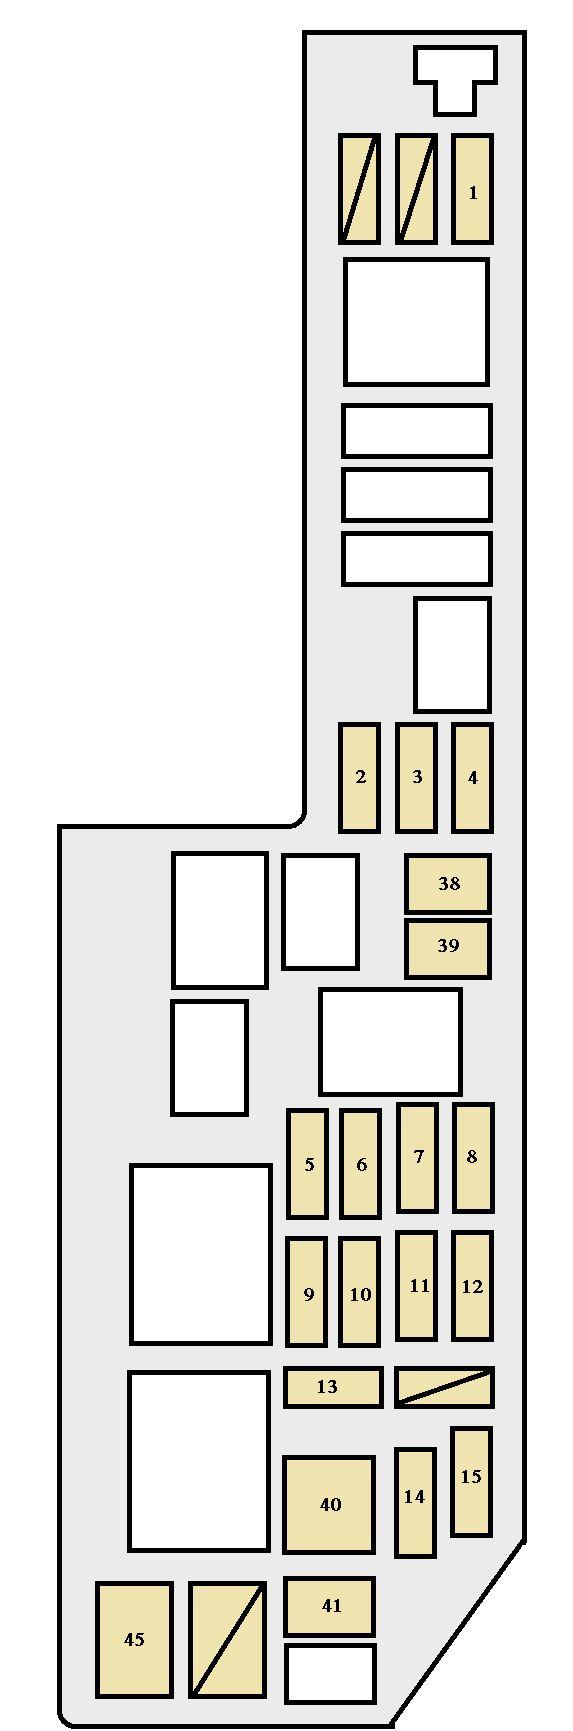 2007 Sienna Fuse Box Diagram Wiring Library Toyota Yaris 2003 98 Download Diagrams U2022 Fuel Pump Relay